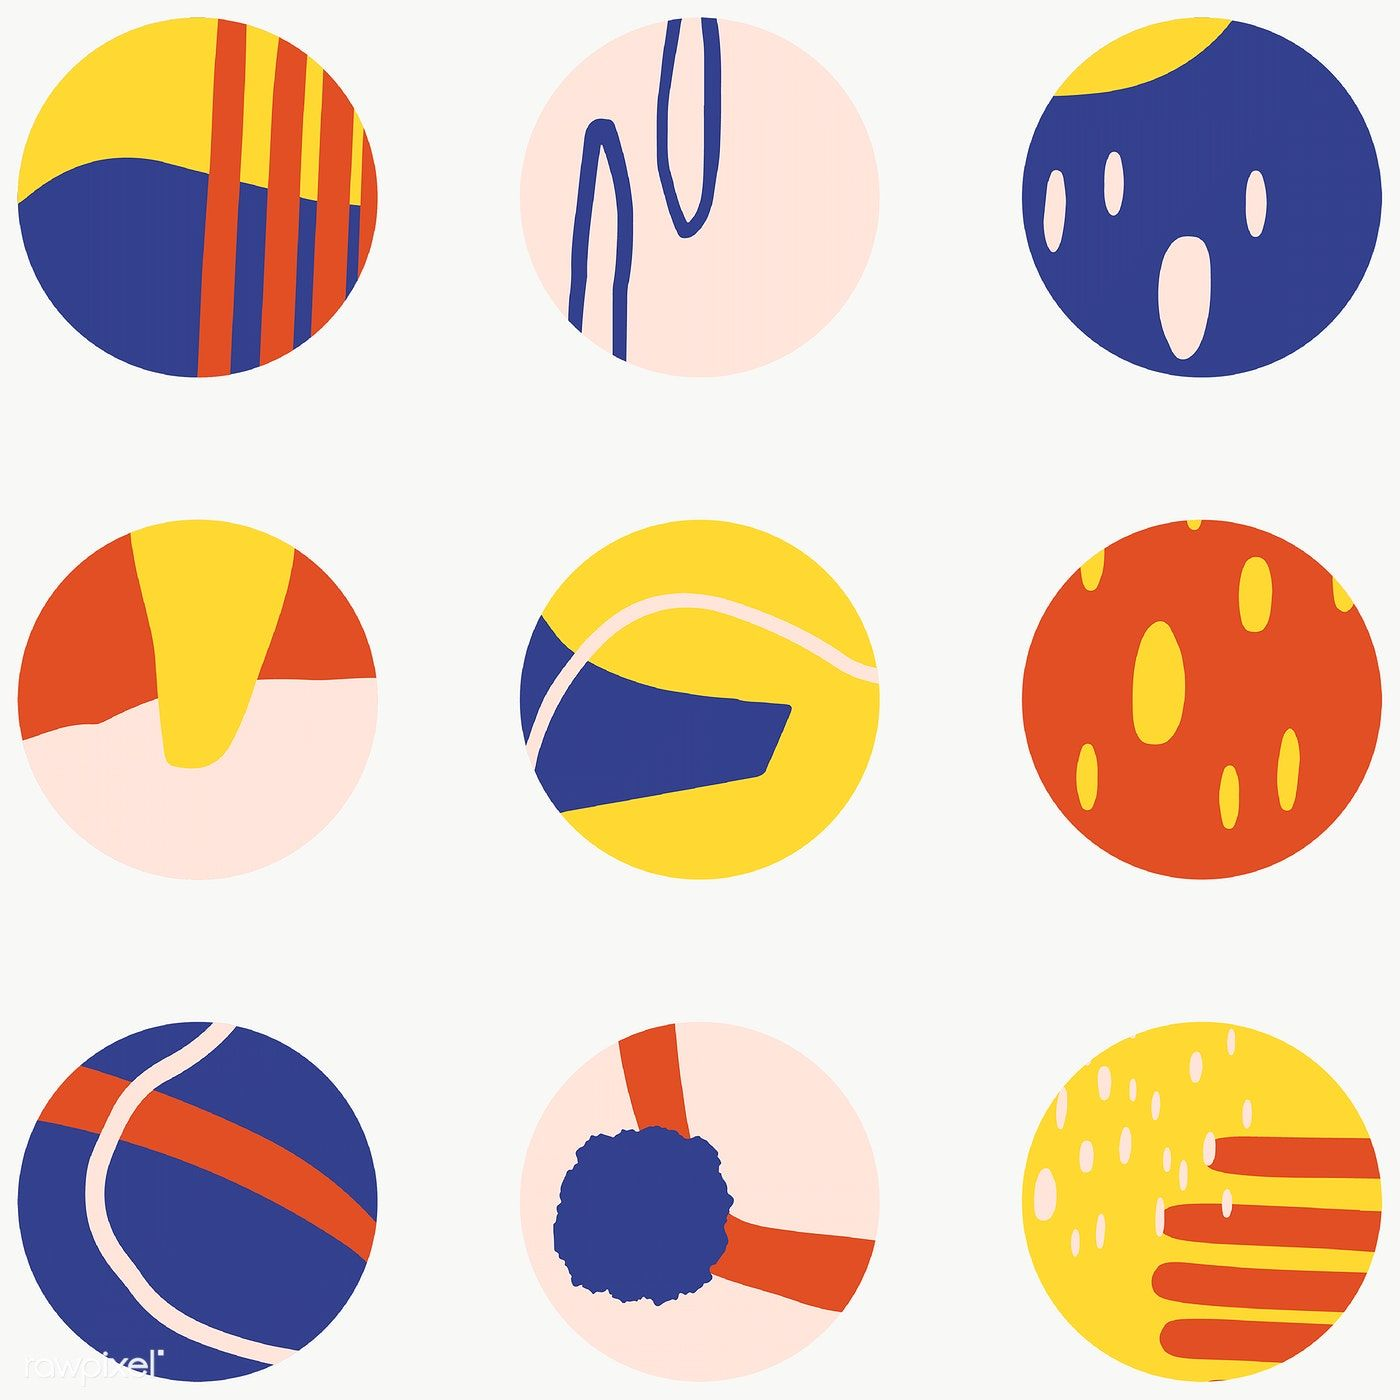 Pixel Art Graphic Design Cool Designs Pic Music Equalizer Illustration Png Clipart Pixel Art Clip Art Cool Designs